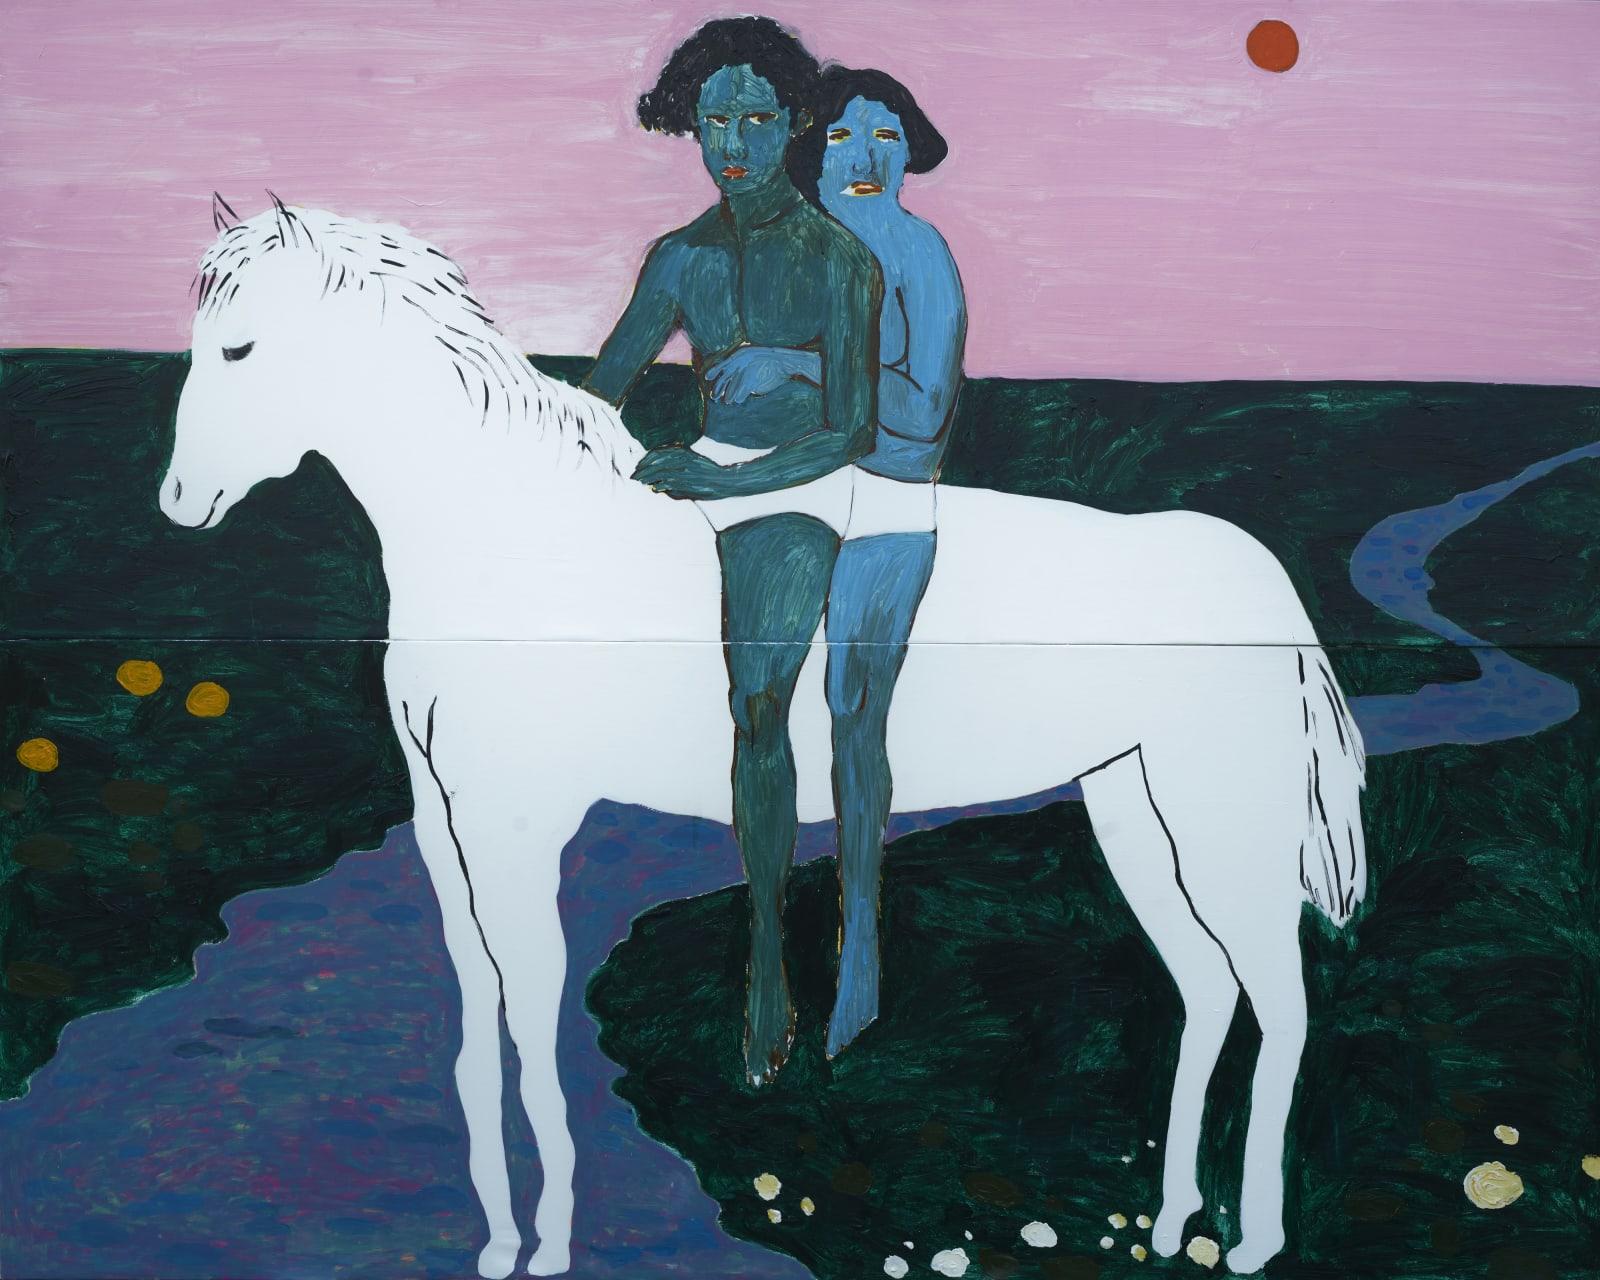 Gideon Appah, Strangers on a white horse, 2020